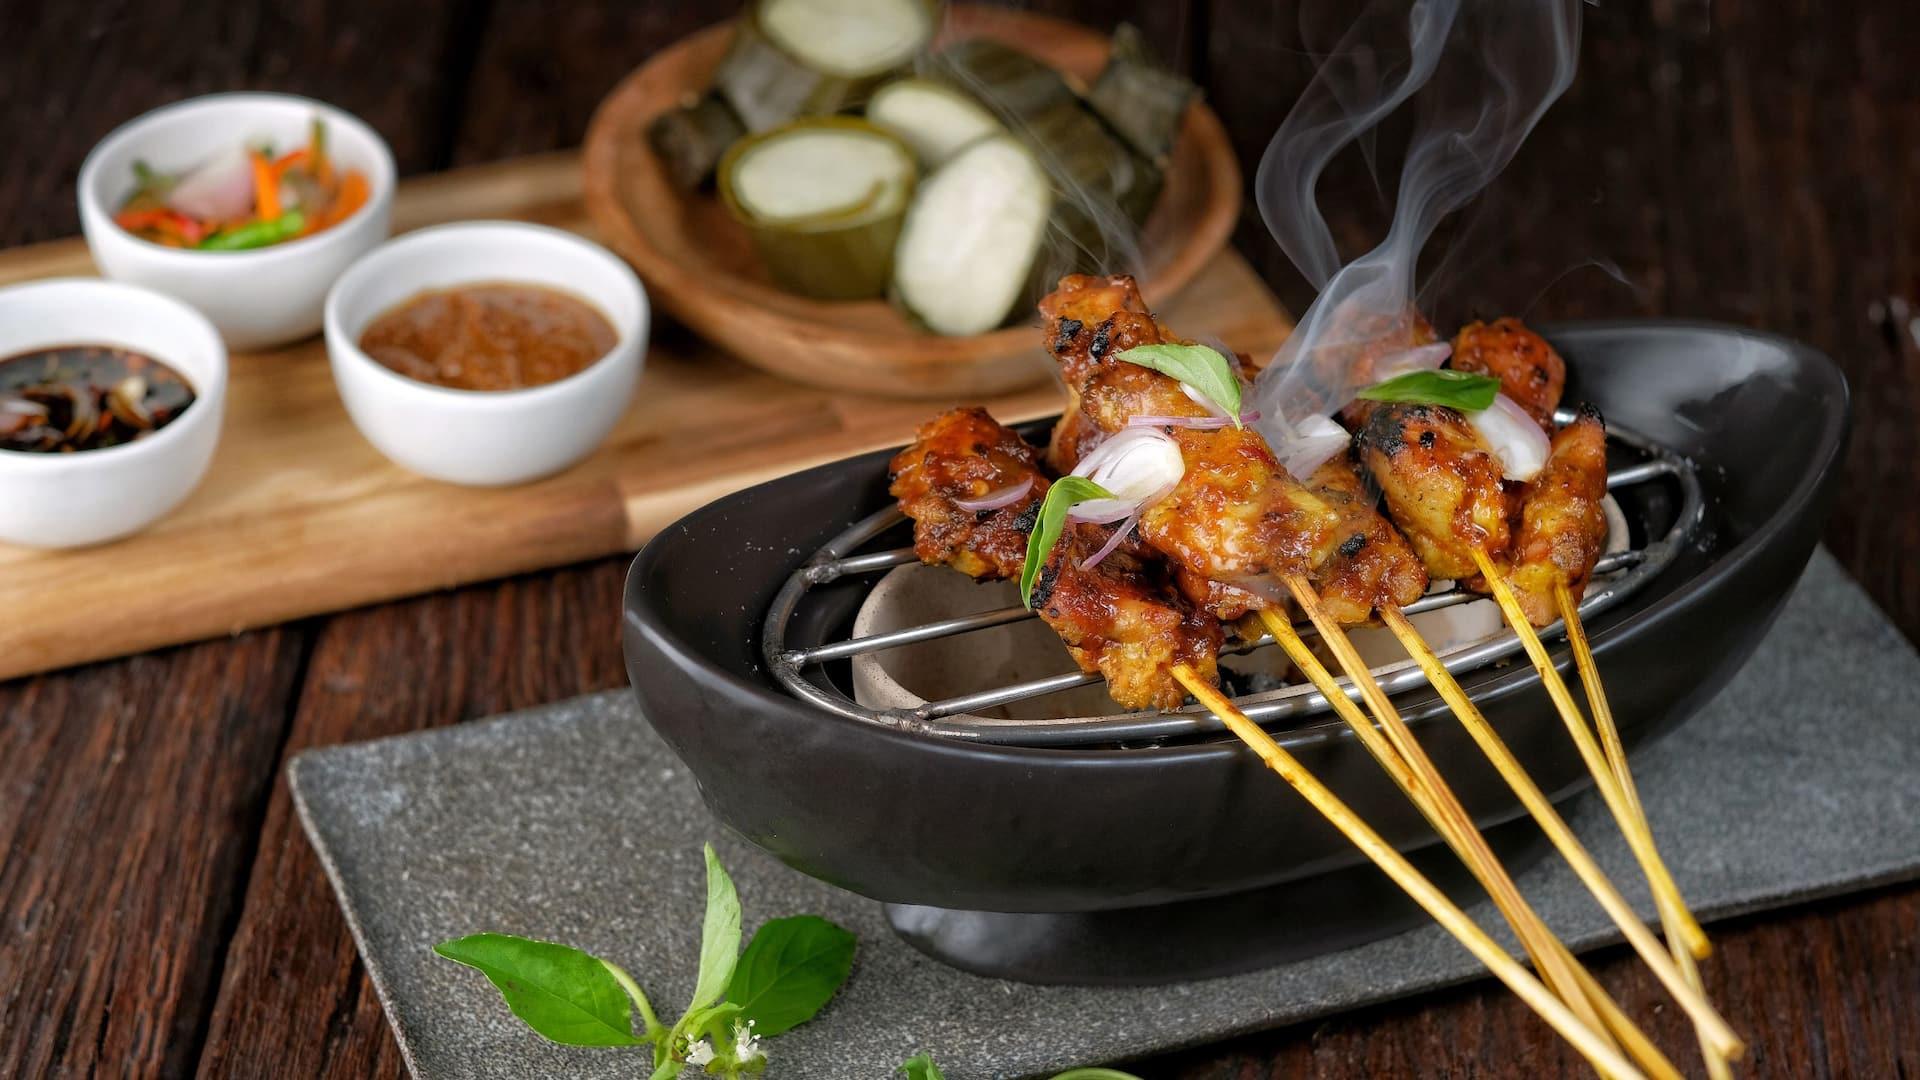 Satay Menu by Angkringan Hyatt, Indonesian Traditional Food Yogyakarta